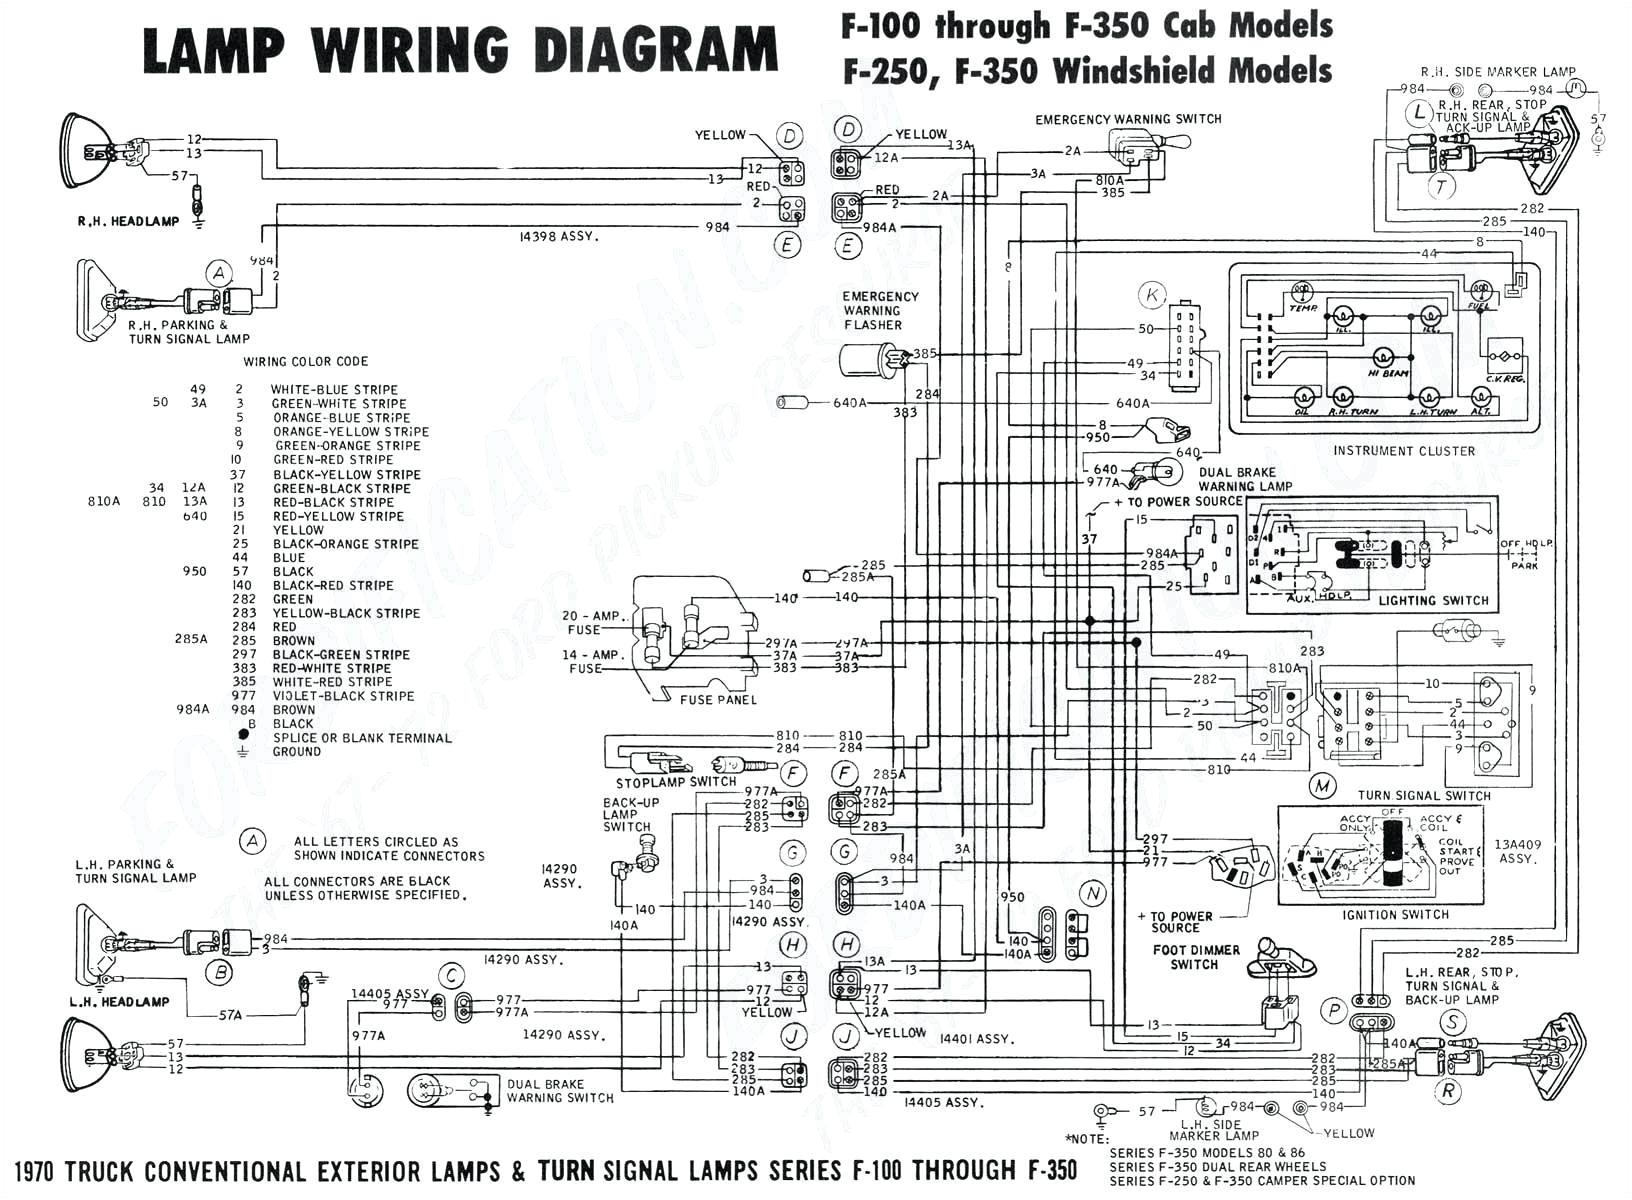 97 rx7 wiring diagram wiring diagram mega 1987 mazda rx 7 ignition switch diagram on 3 8 buick engine diagram